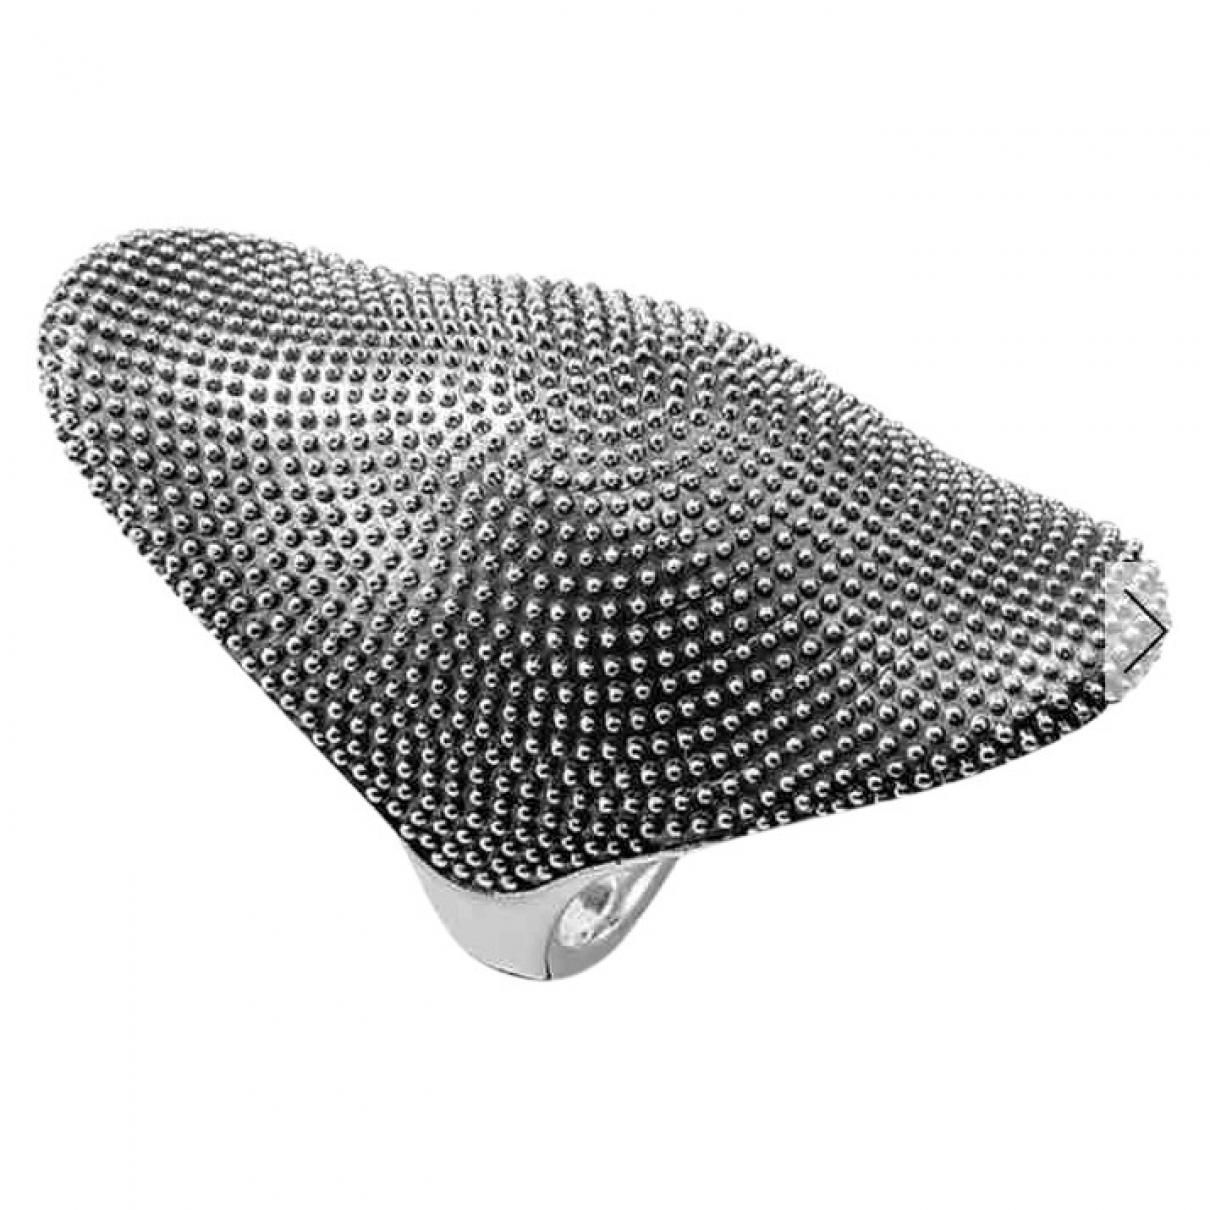 Thomas Sabo \N Ring in  Grau Silber